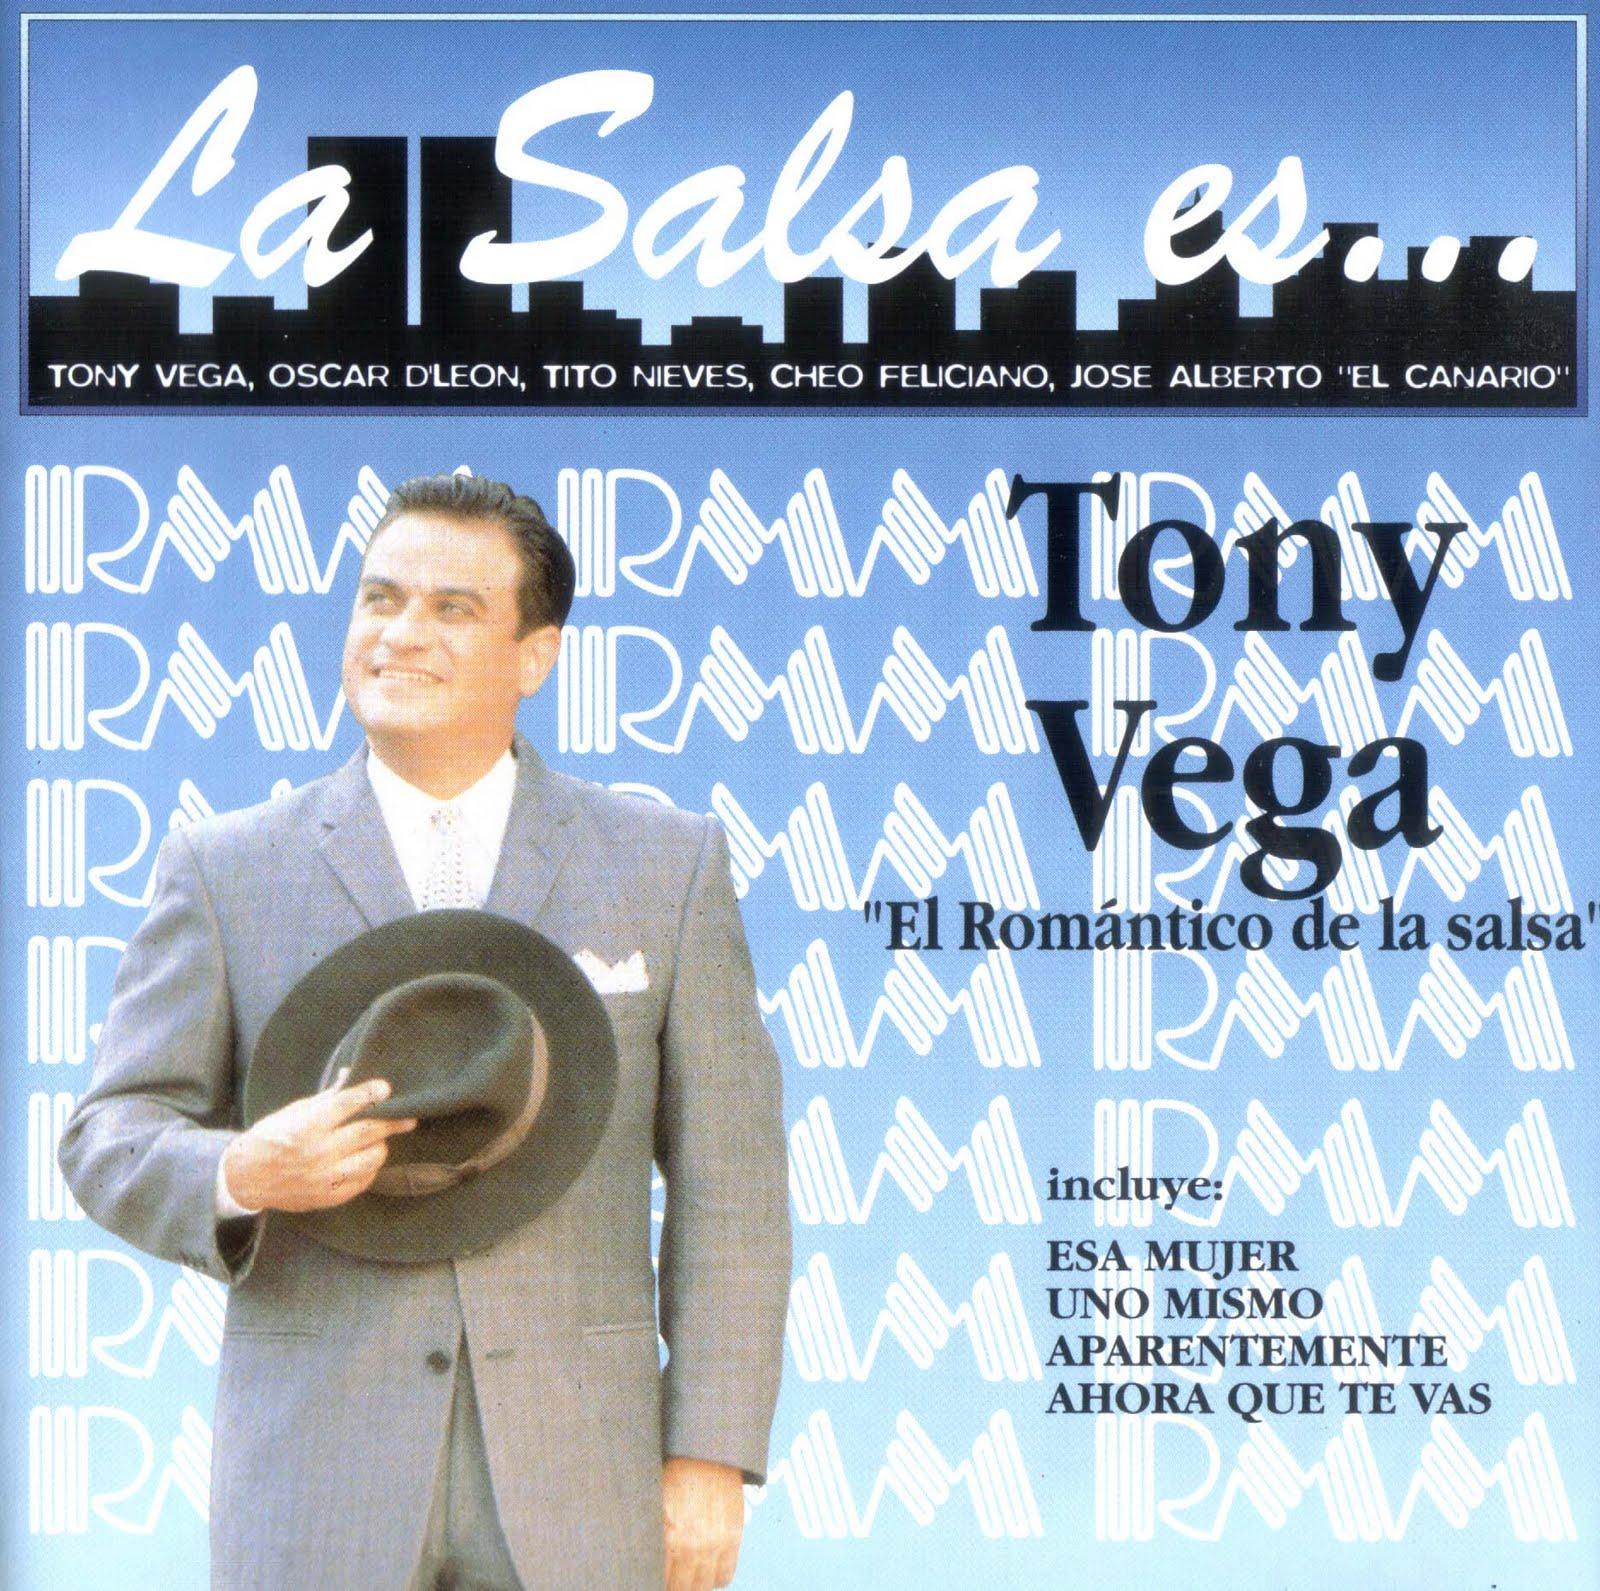 salseroconestilo: Esa Mujer - Tony Vega